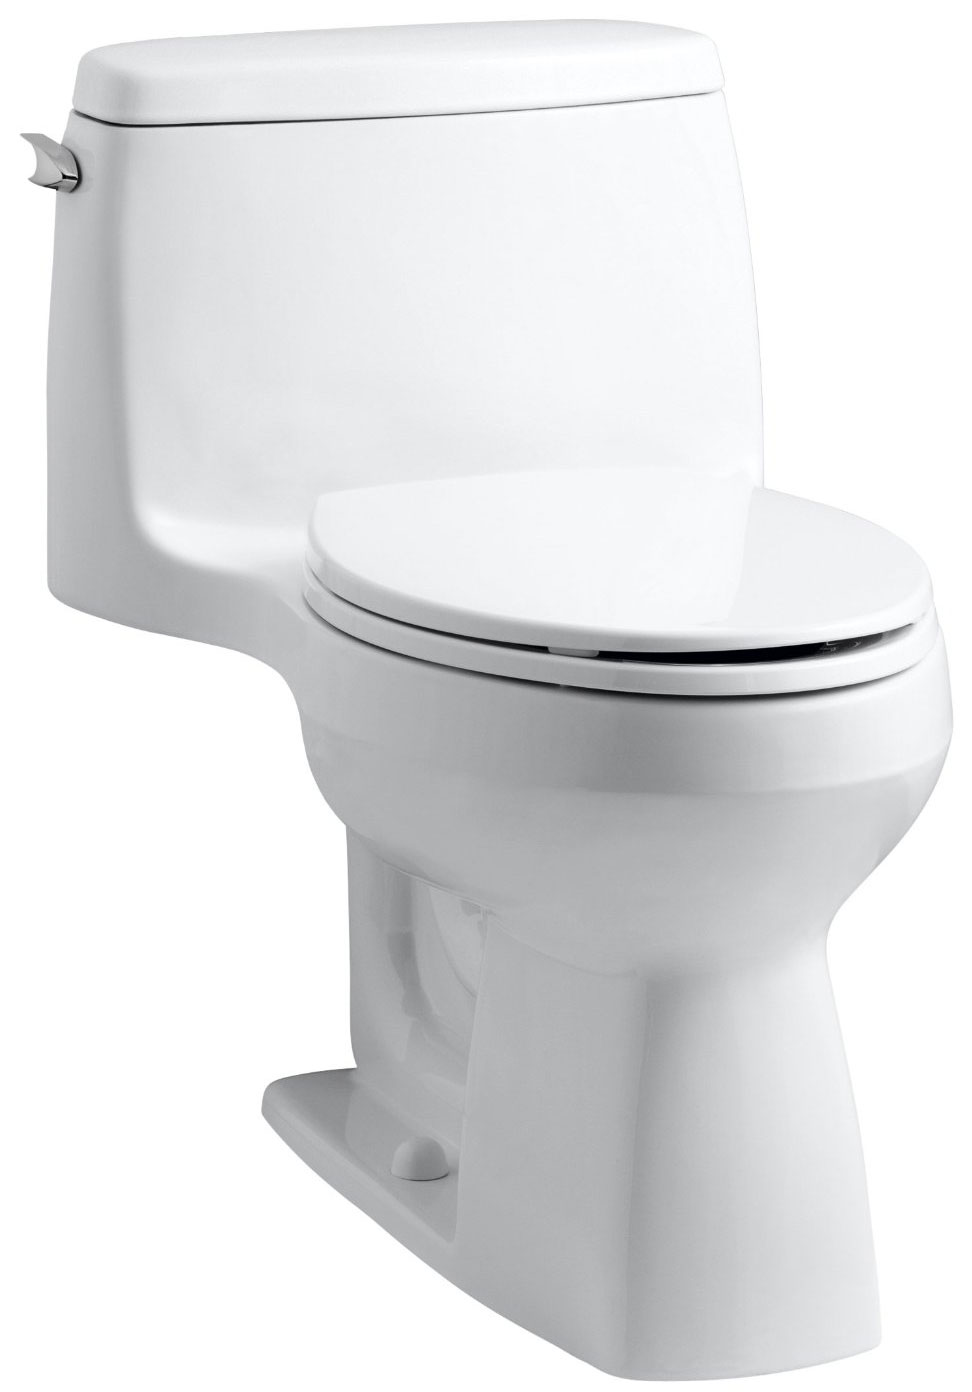 Kohler Elongated Raised Toilet Mexican Sand